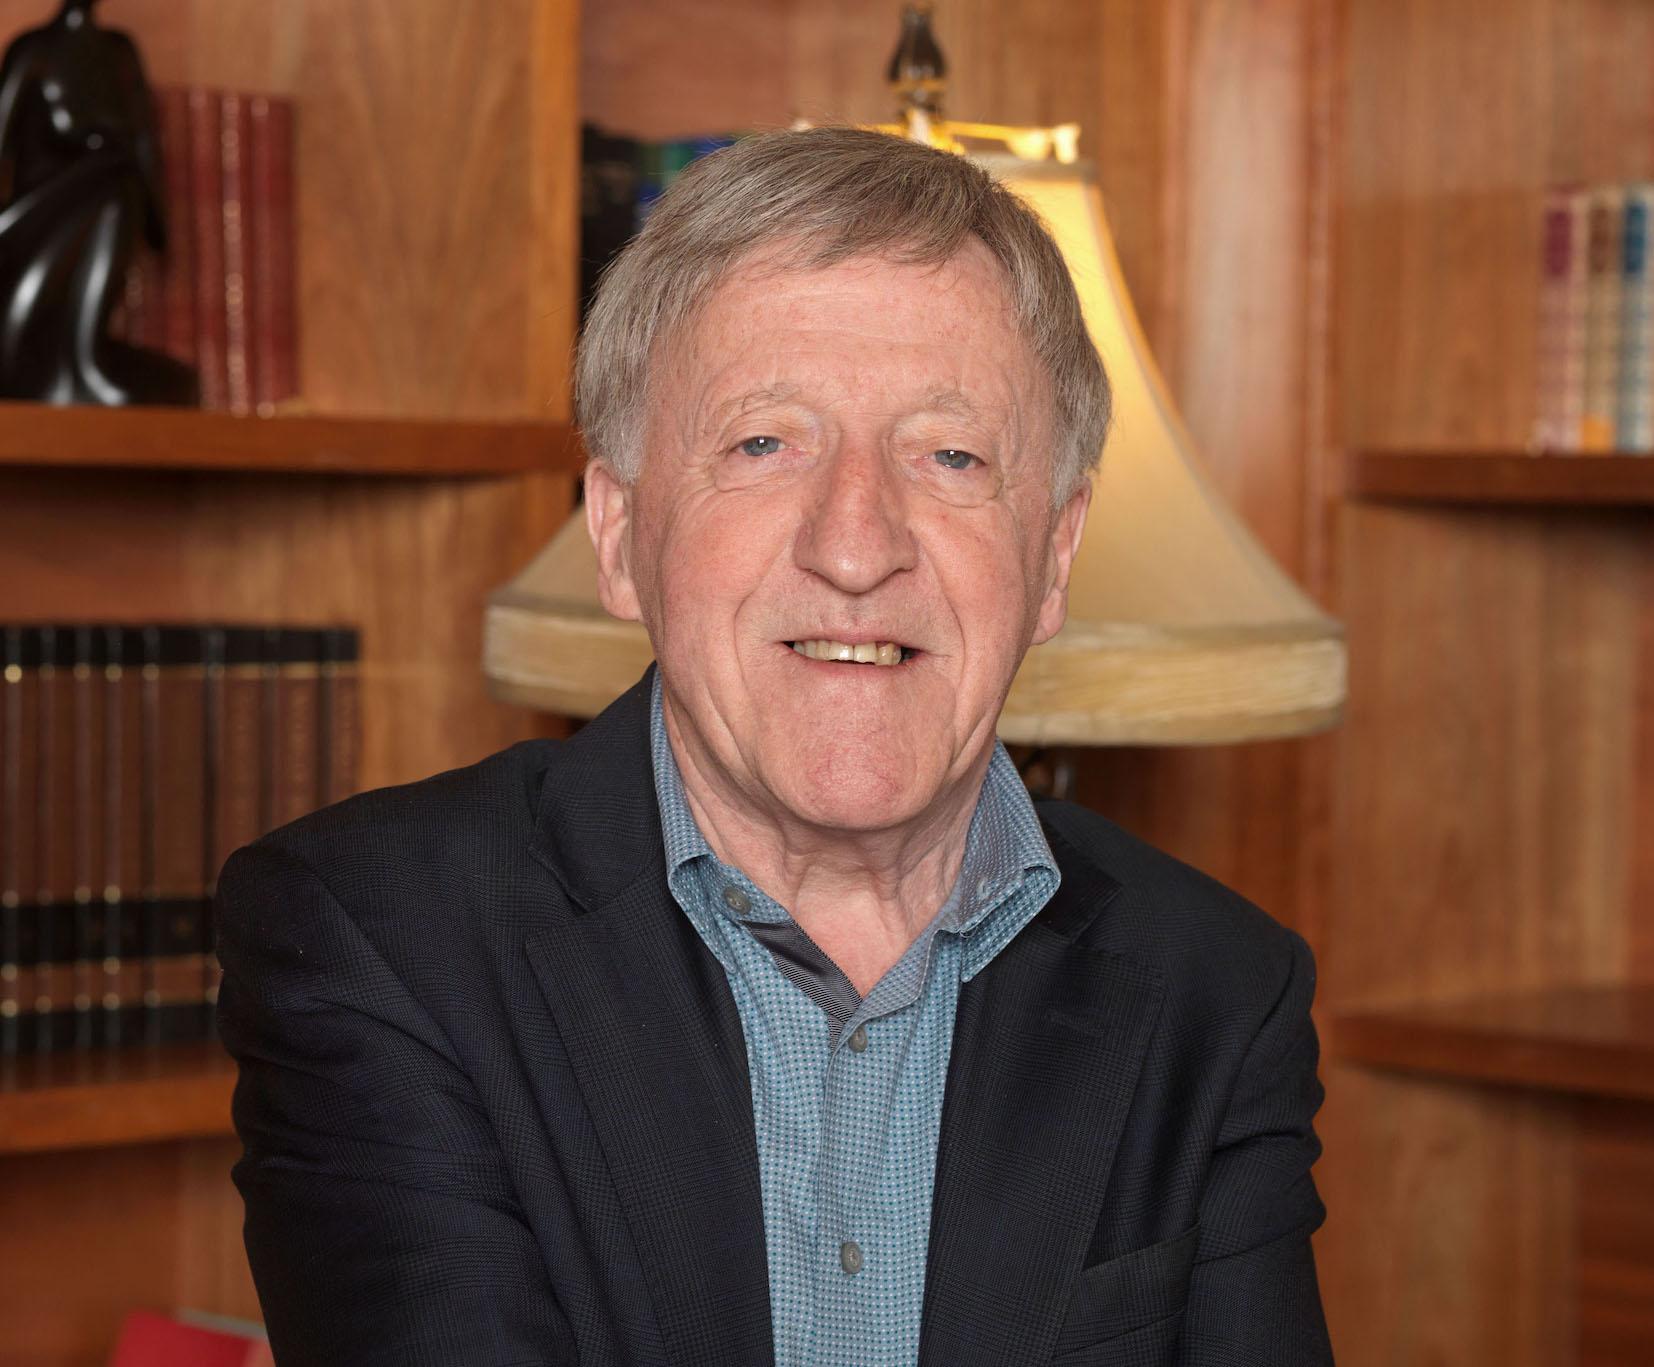 Chieftain Paddy Moloney